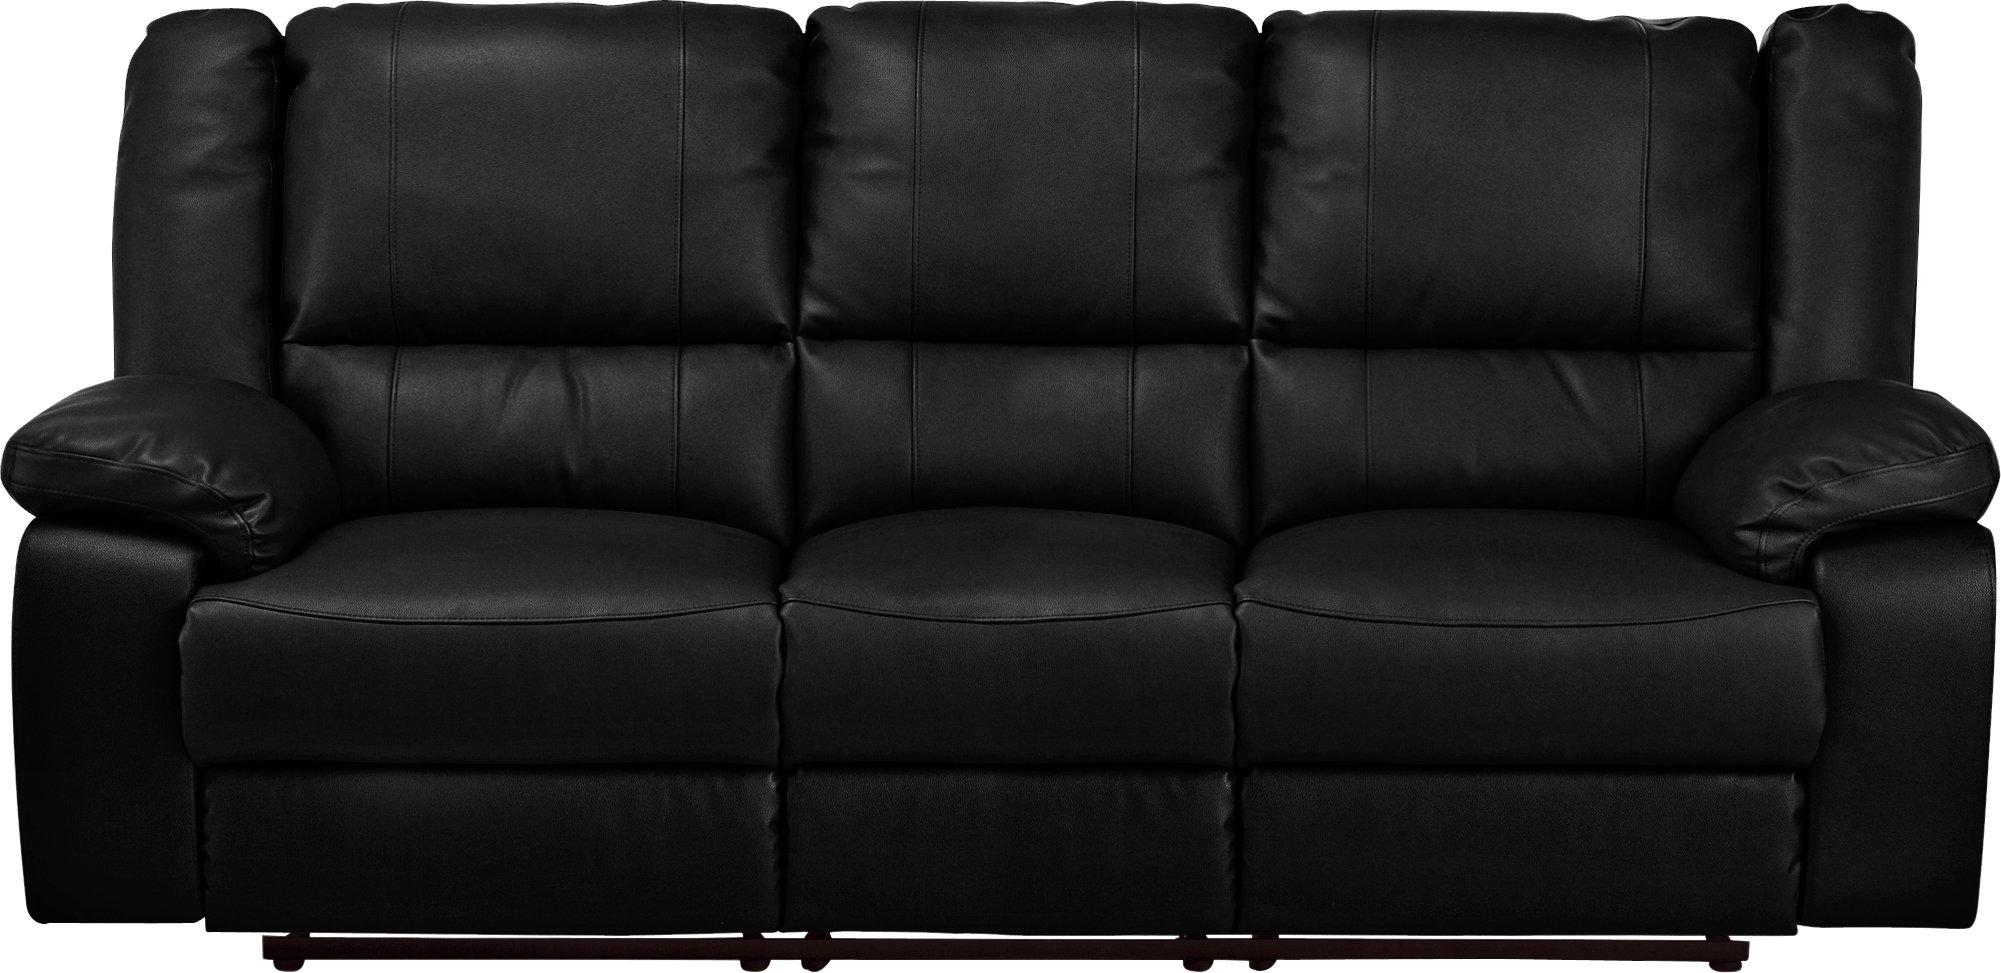 Argos Home Bruno 3 Seater Manual Recliner Sofa - Black